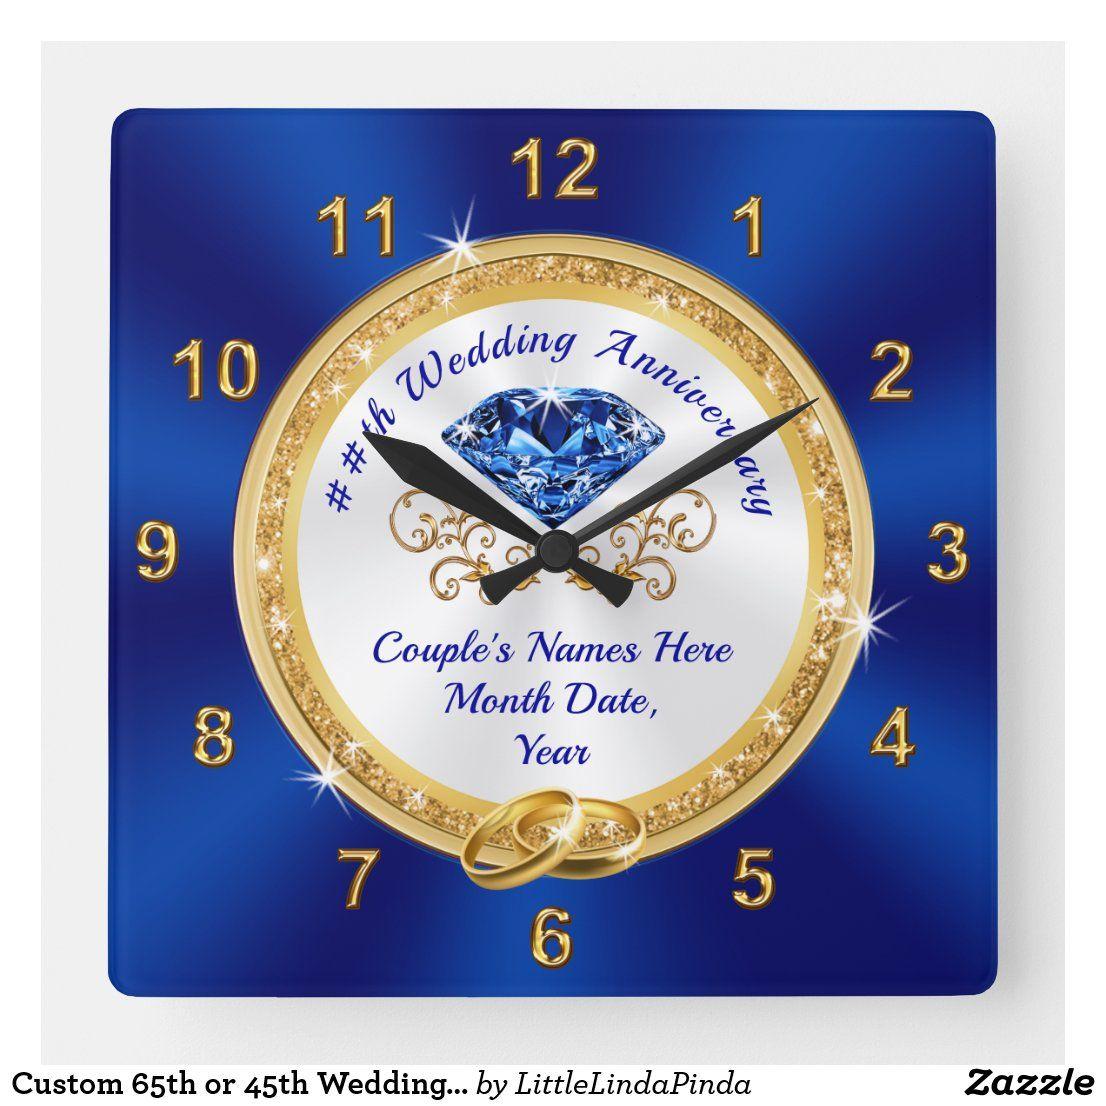 Custom 65th or 45th Wedding Anniversary Gift Ideas Square